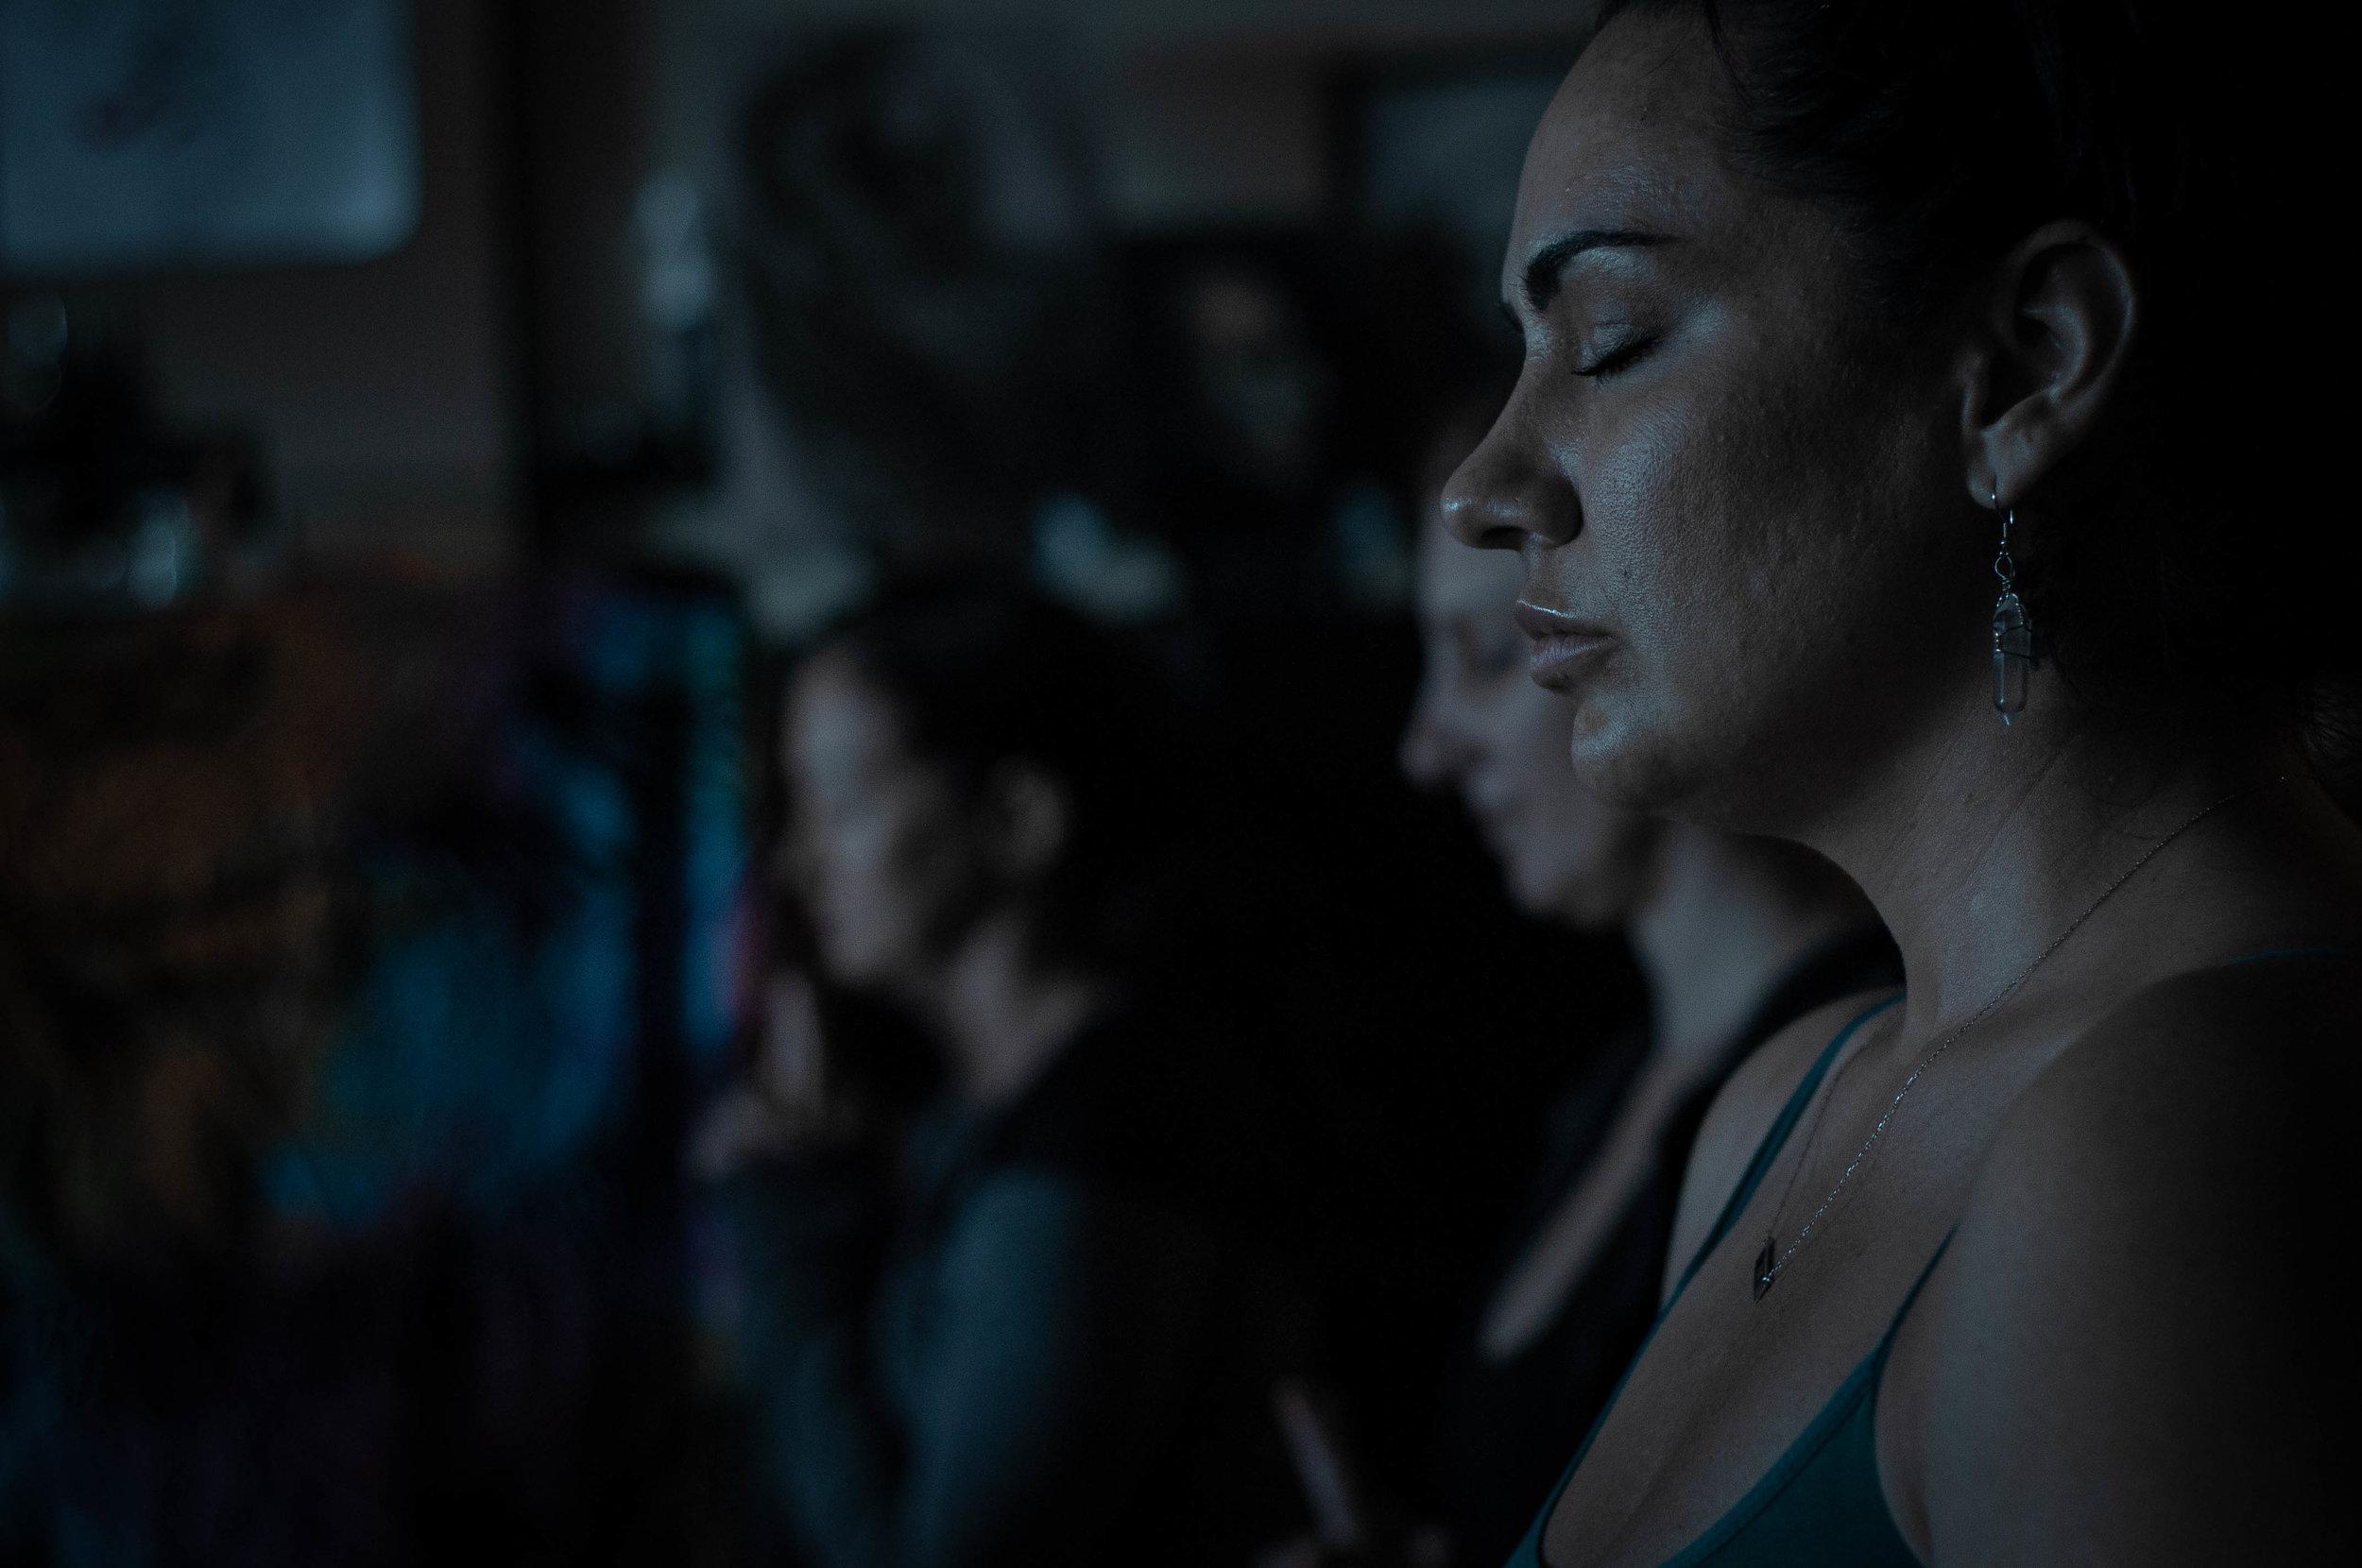 daayani yoga launch party @ spellbound salon: june16.18 -